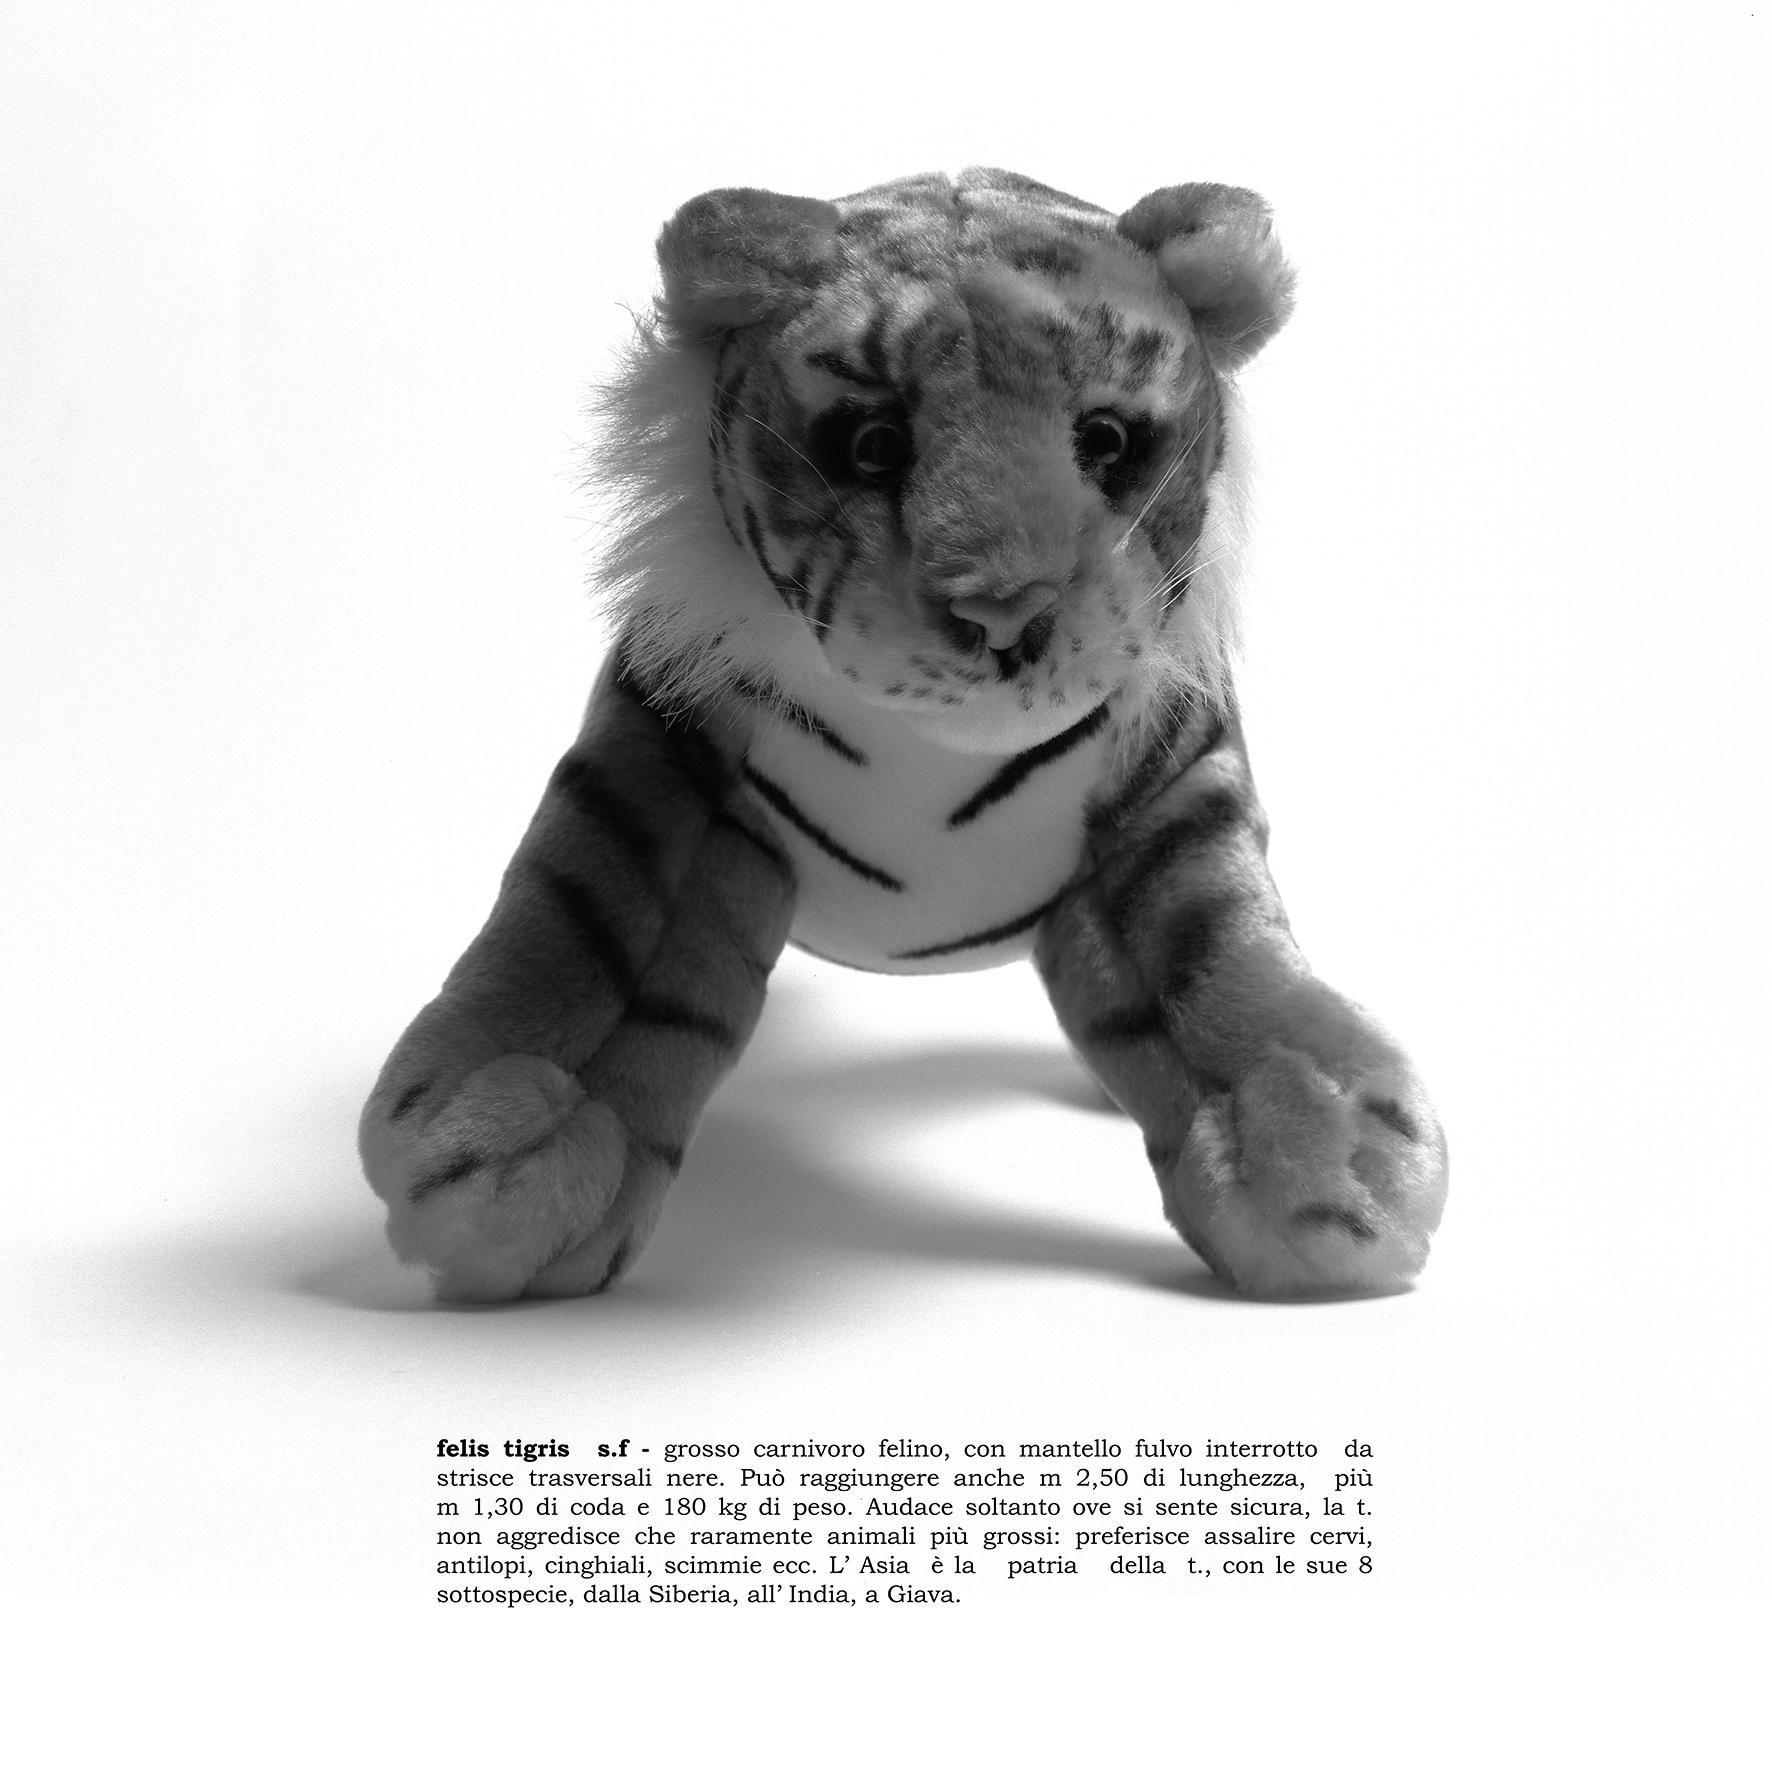 felis tigris